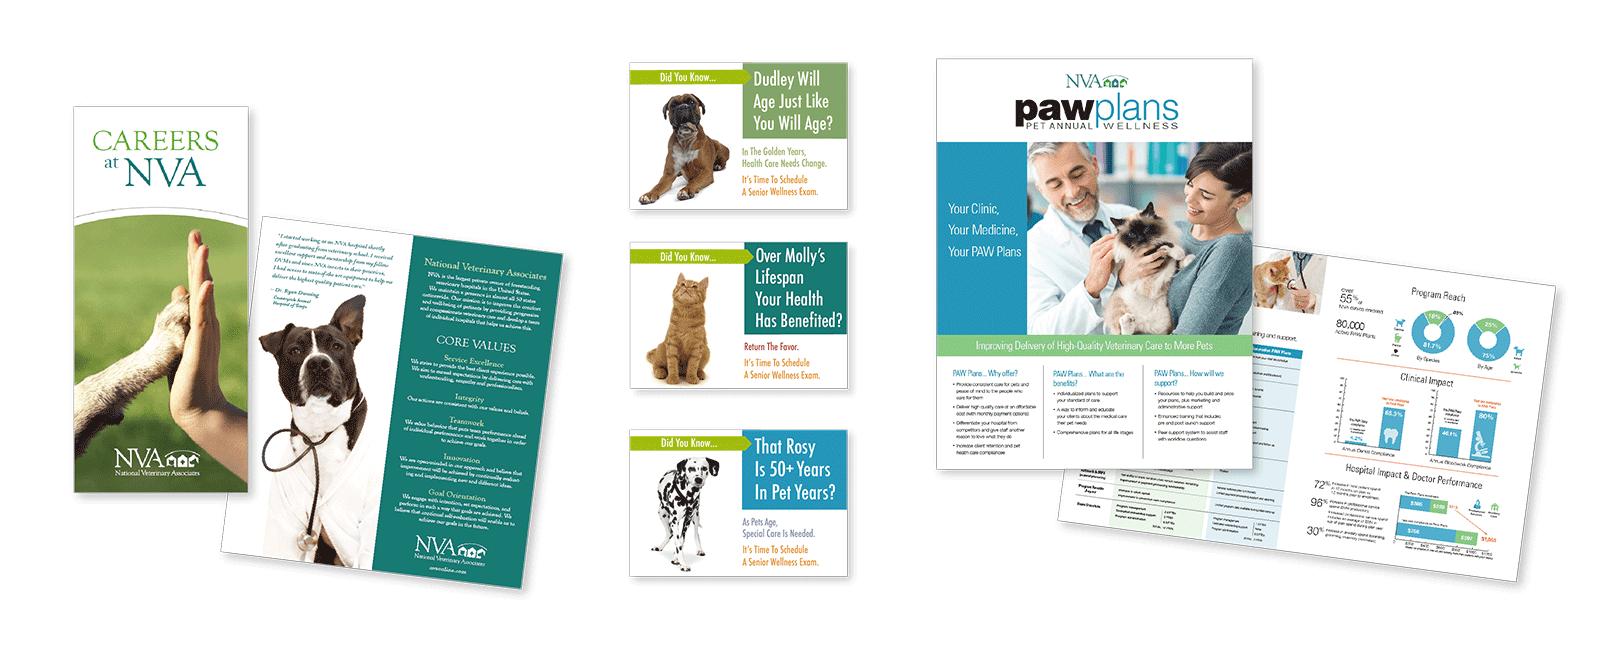 National Veterinary Associates